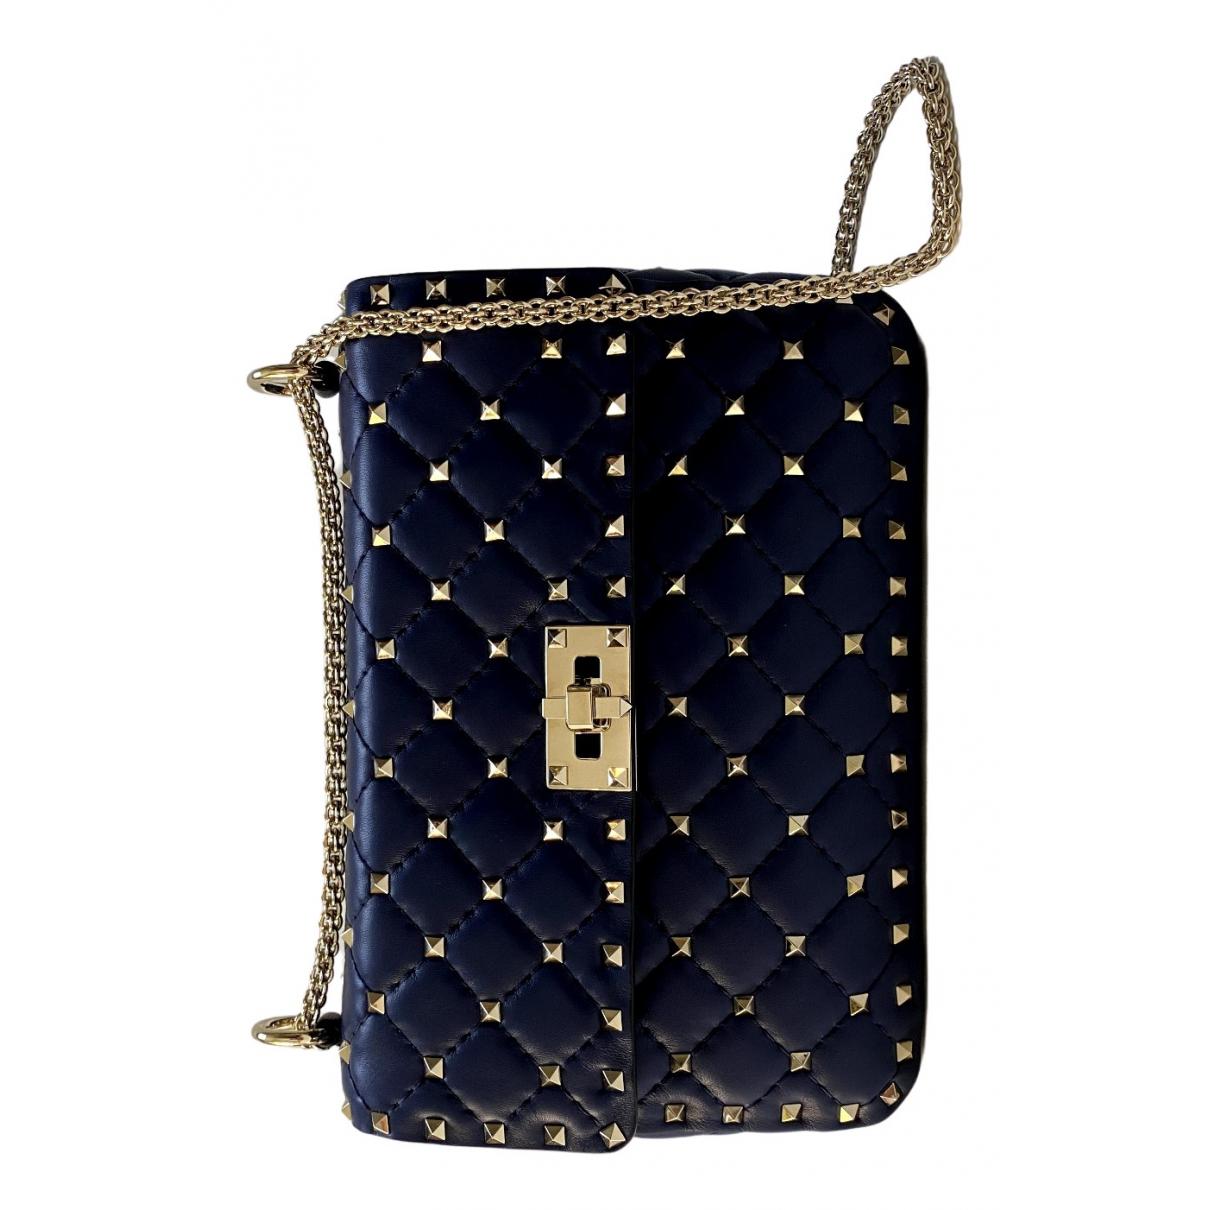 Valentino Garavani Rockstud spike Blue Leather handbag for Women \N